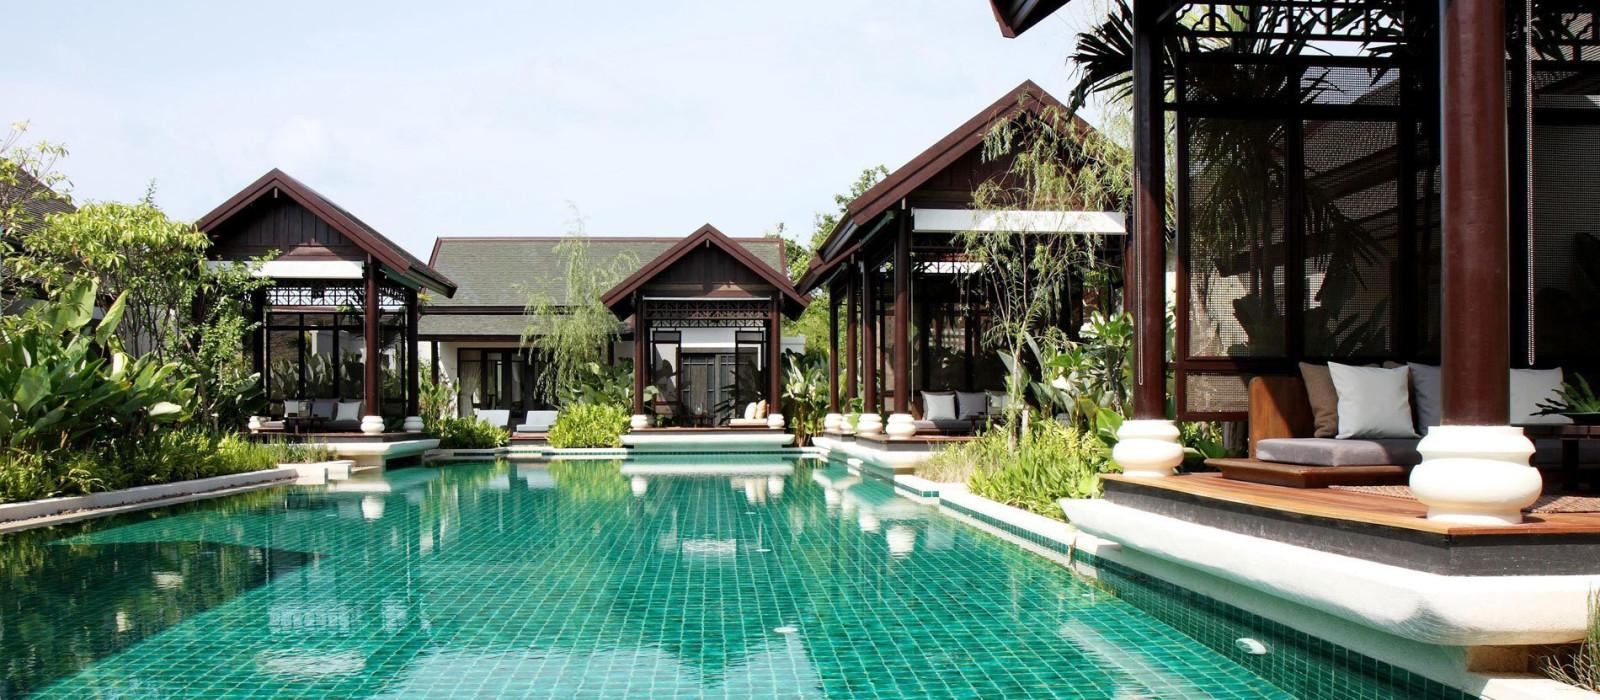 Hotel Anantara Lawana (Chaweng Beach) Thailand